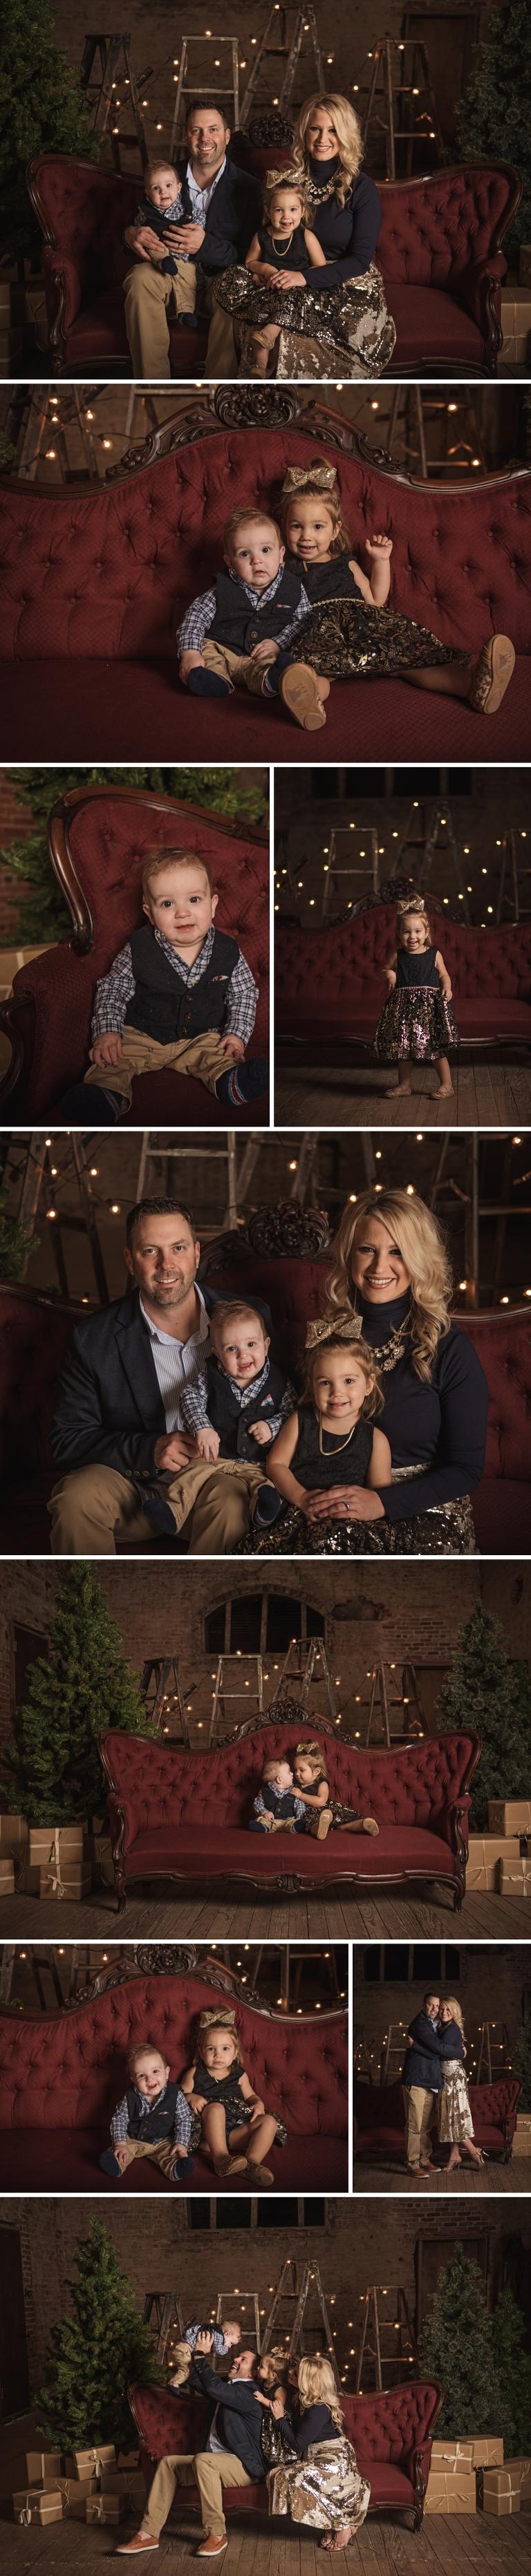 Dallas Christmas Mini Session Photographer